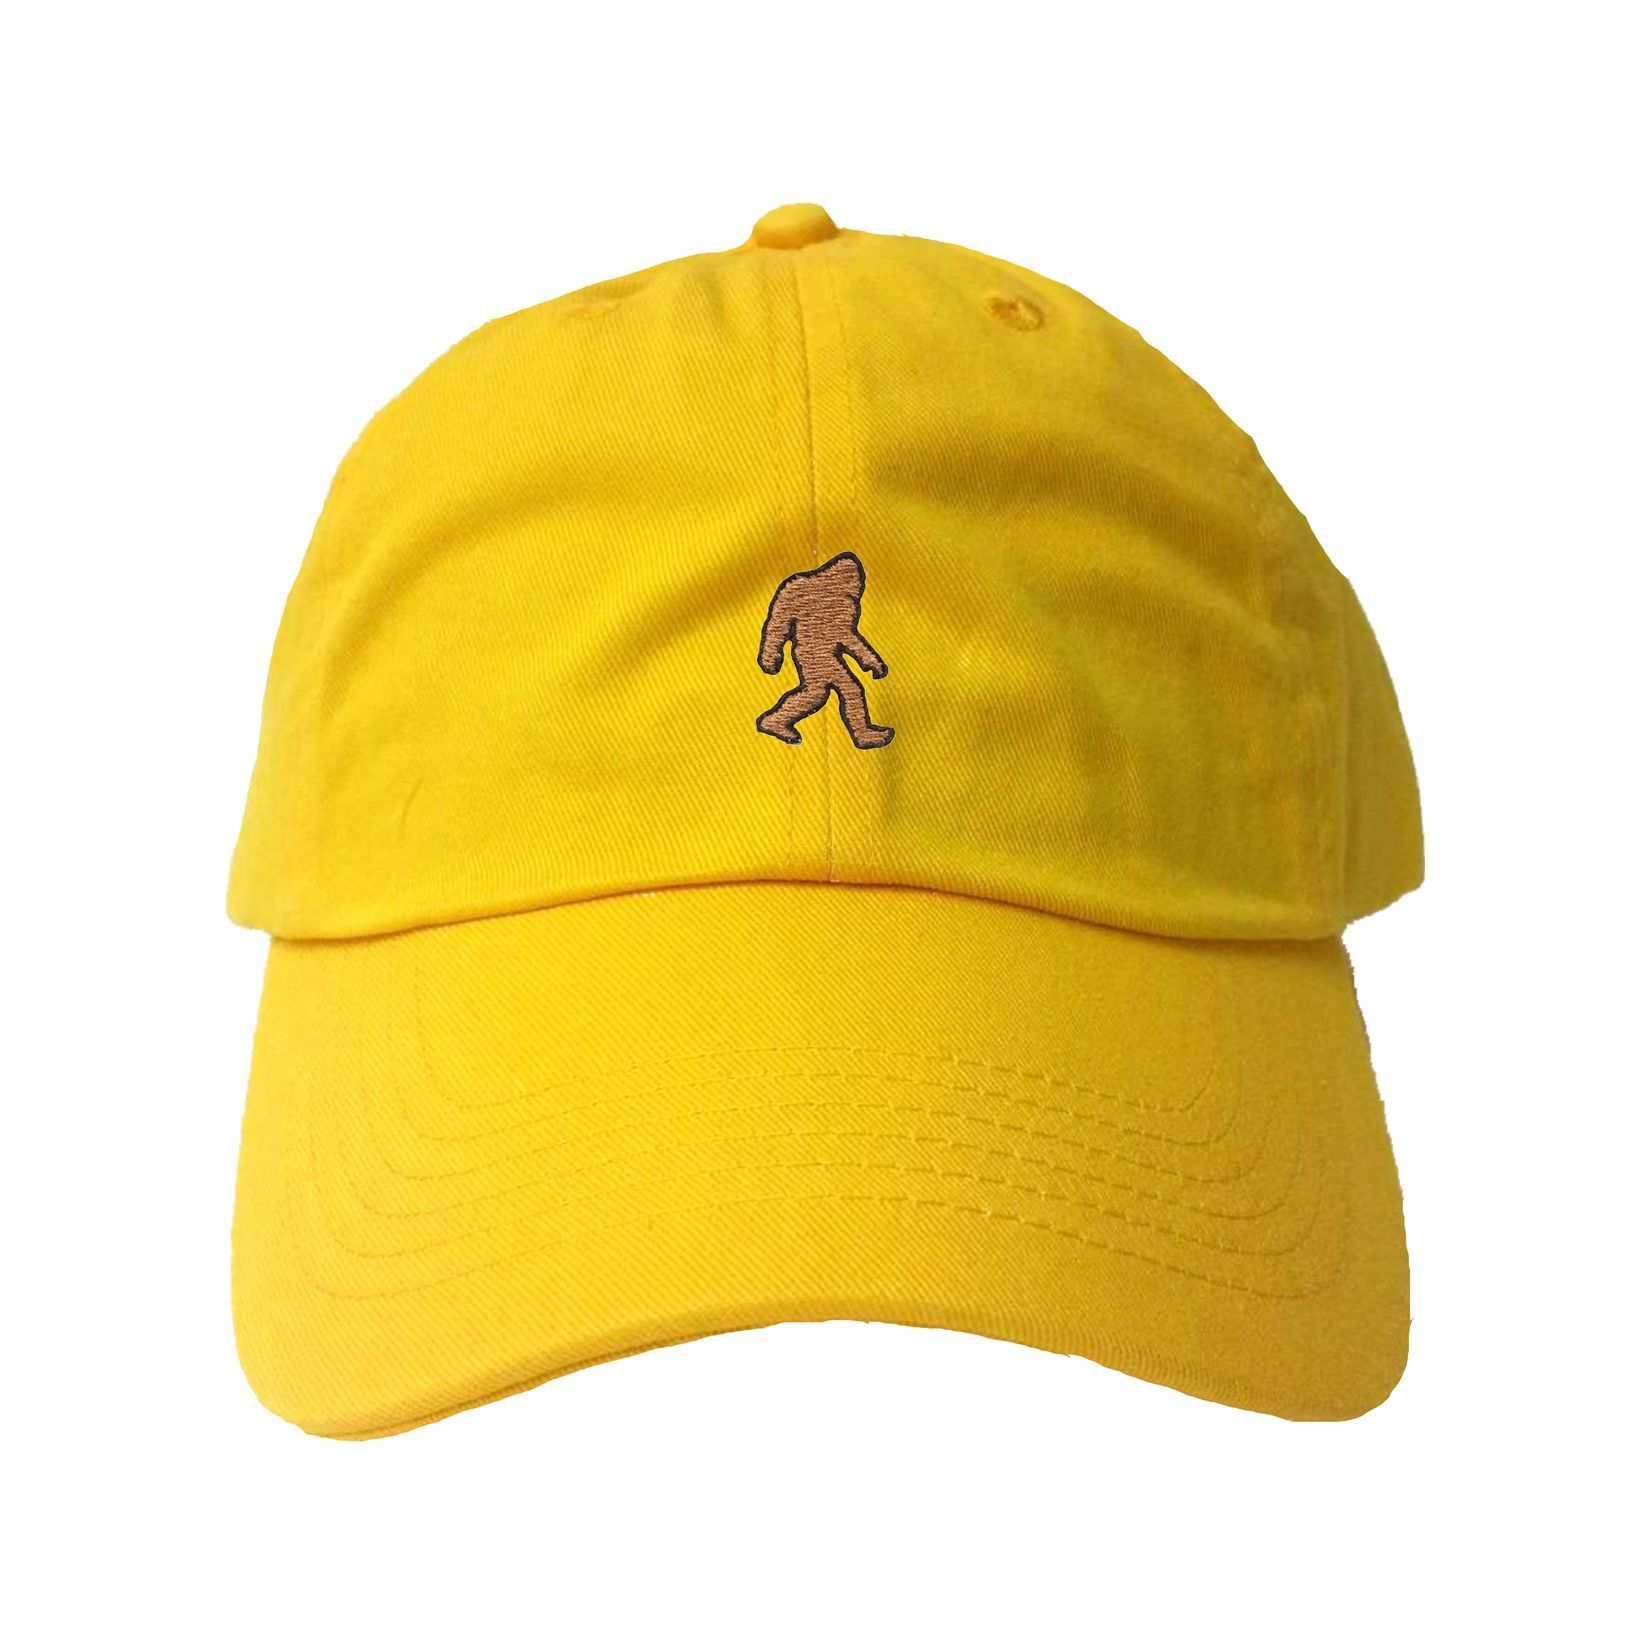 02b0908712b ... Squatch King Threads. Adult Bigfoot Sasquatch Embroidered Dad Hat Cap